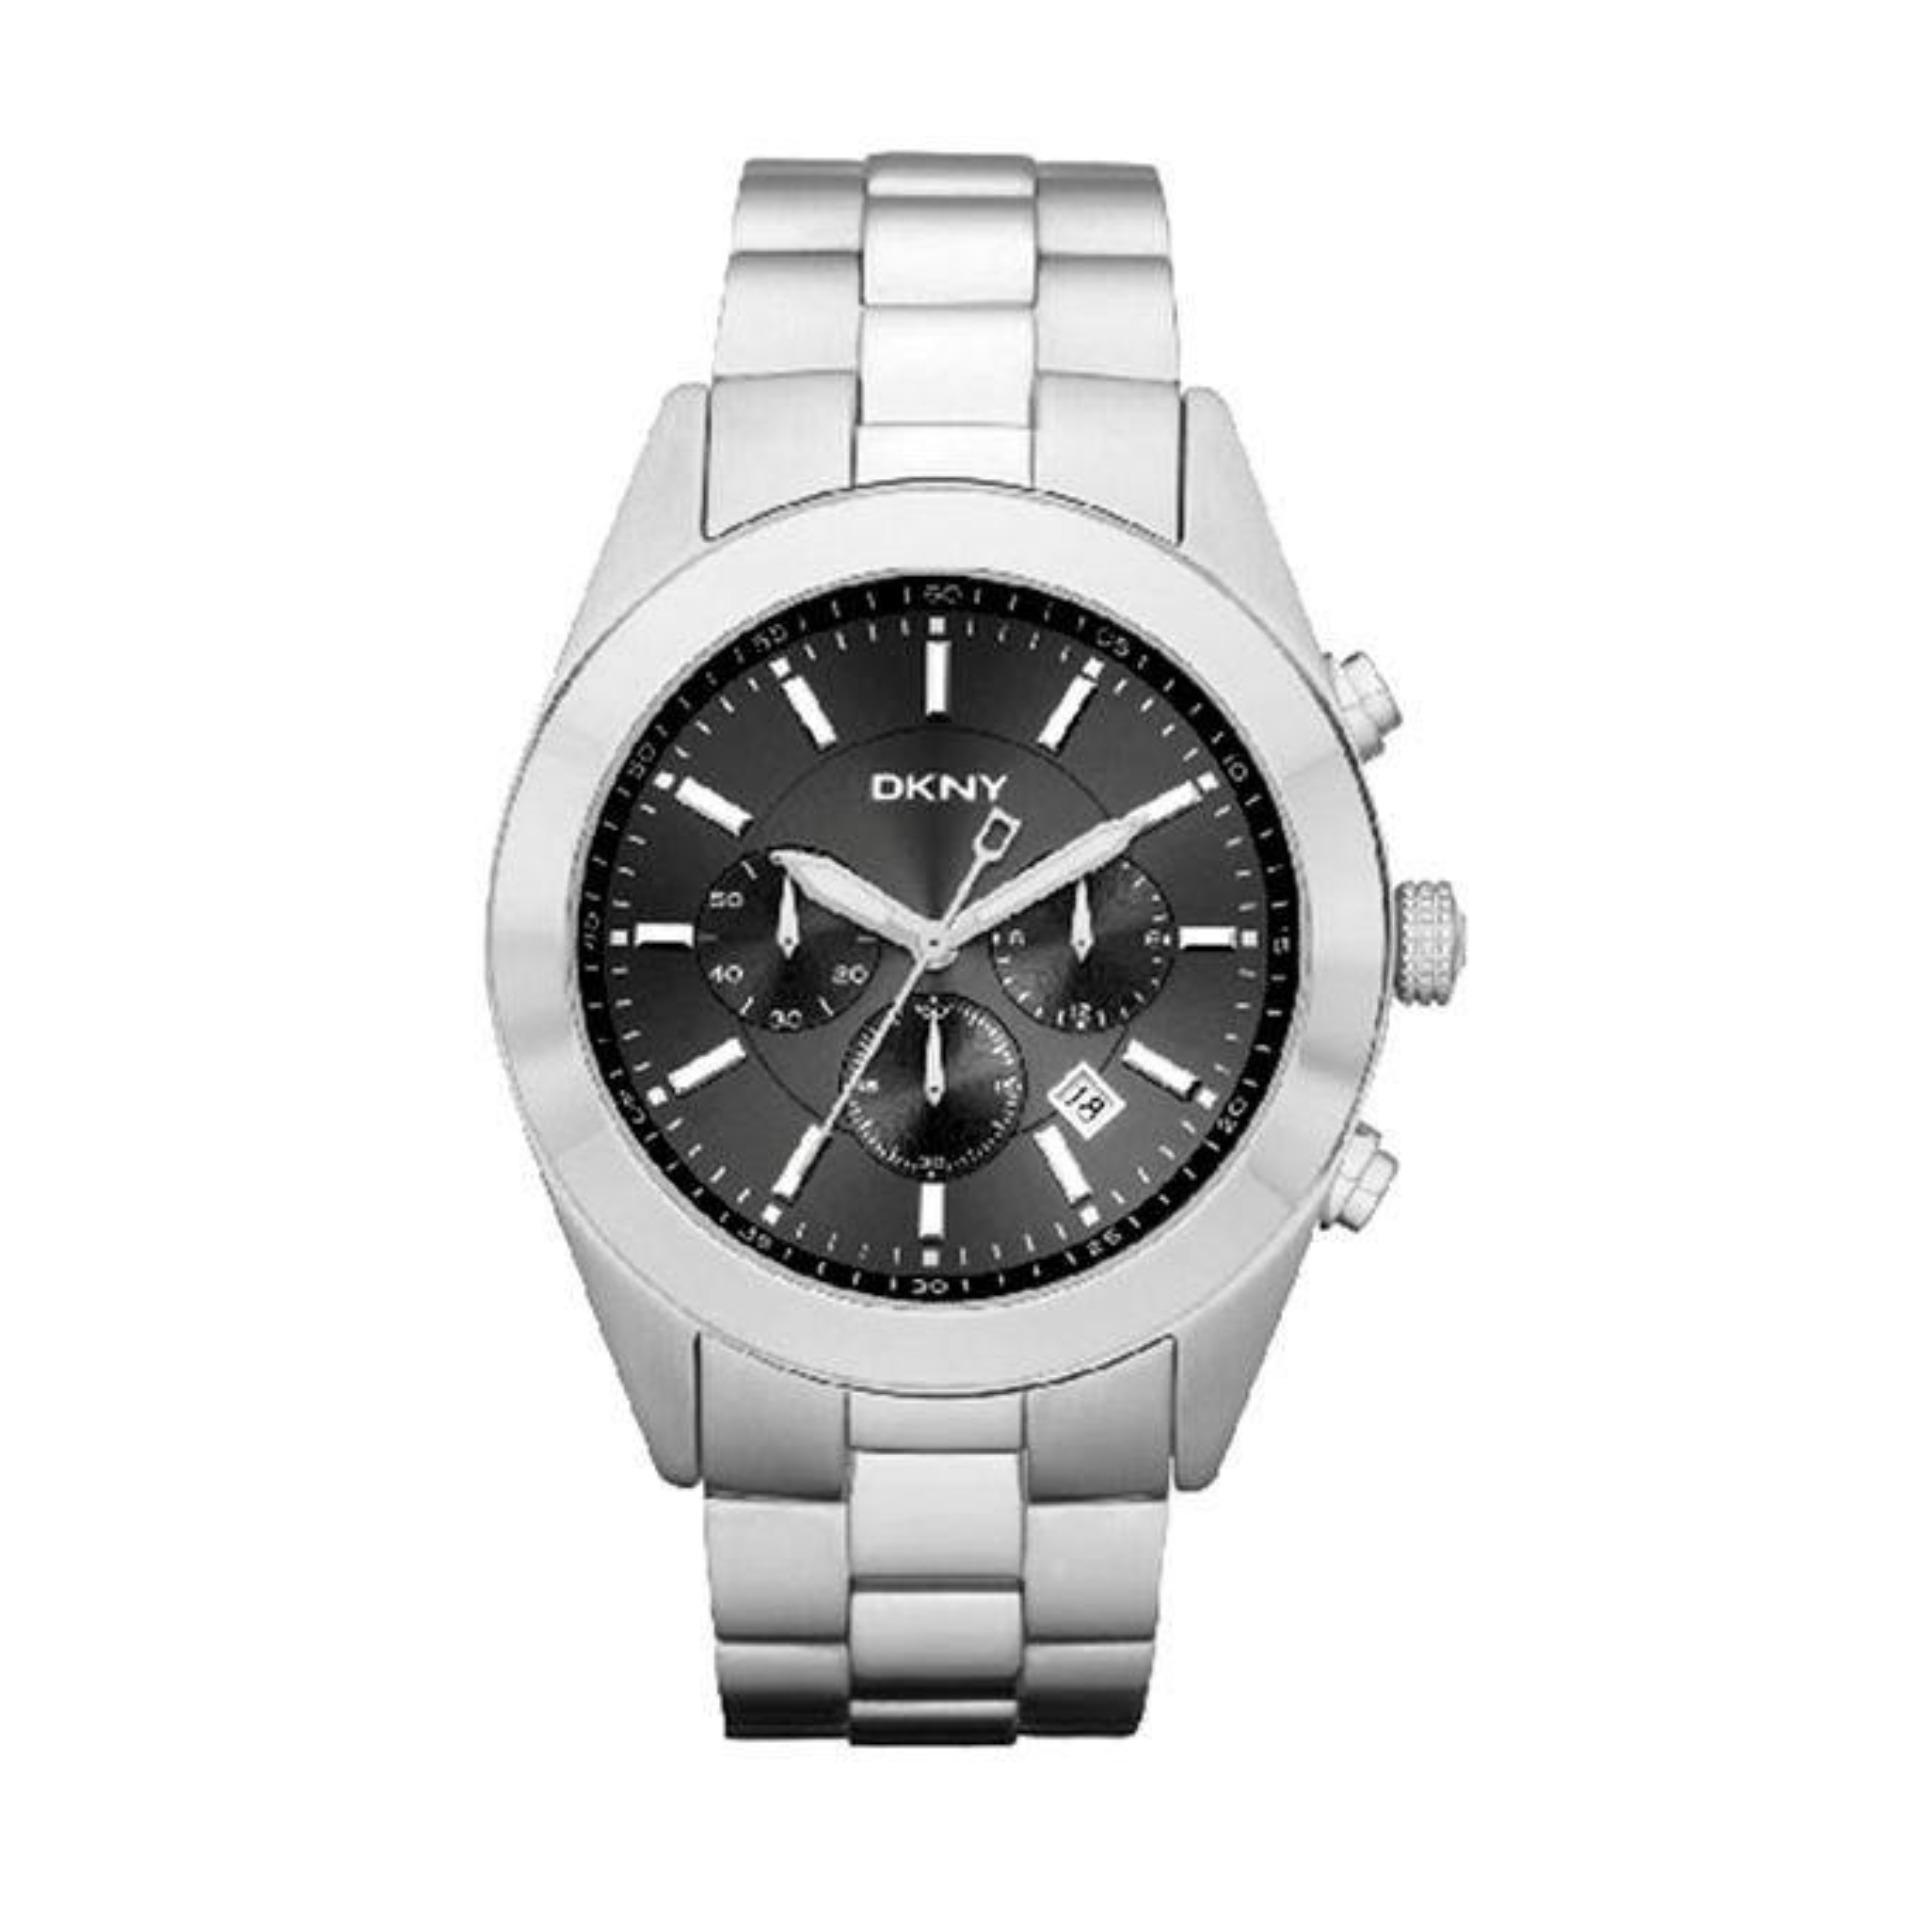 Stainless Steel NY1507 Nolita Wrist Watch - Silver